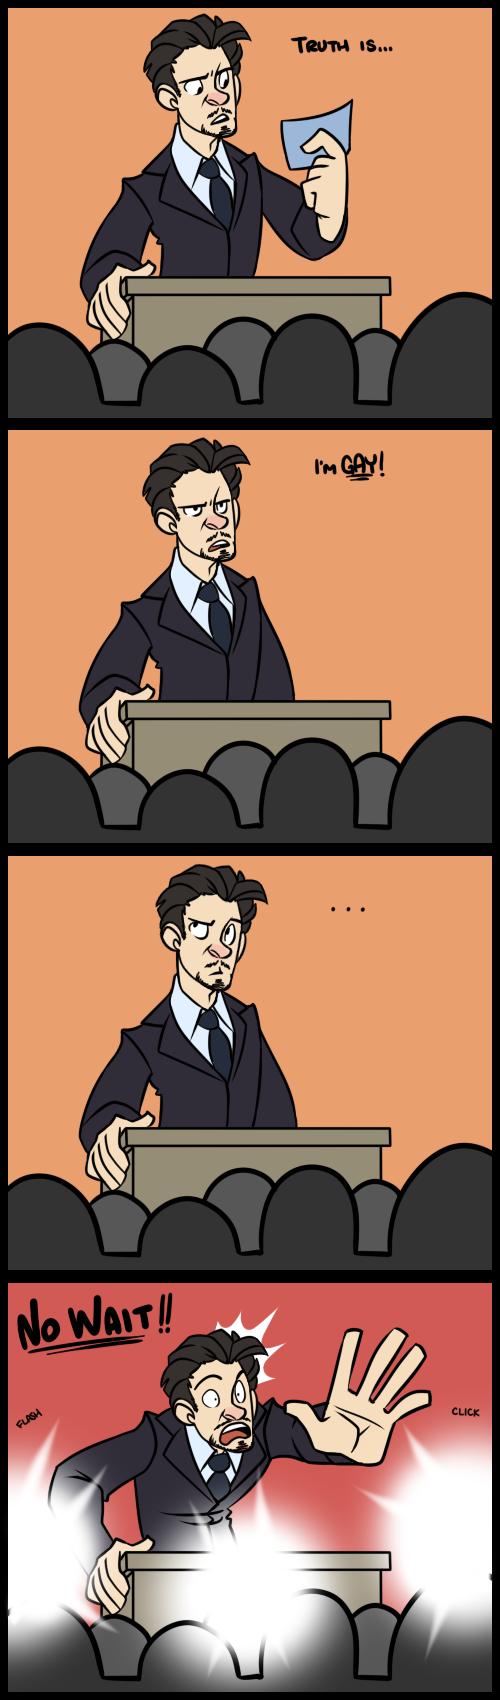 IronMan - Alternate Ending by cartoonjunkie on DeviantArt